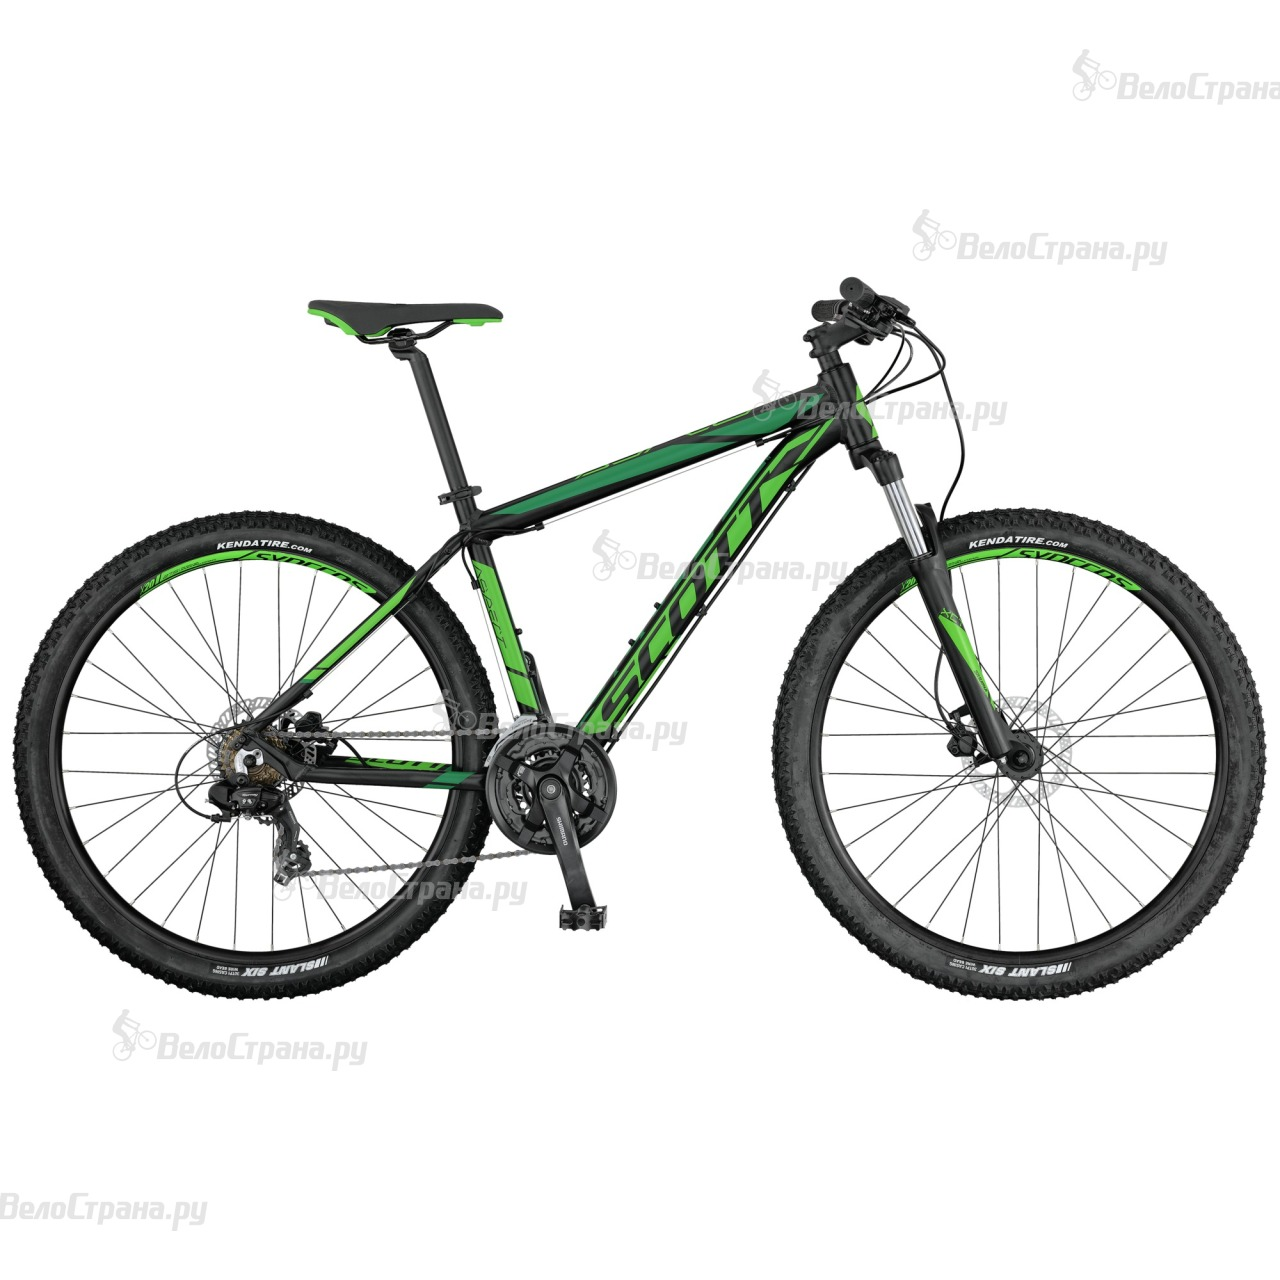 Велосипед Scott Aspect 960 (2017) велосипед scott aspect 700 27 5 2016